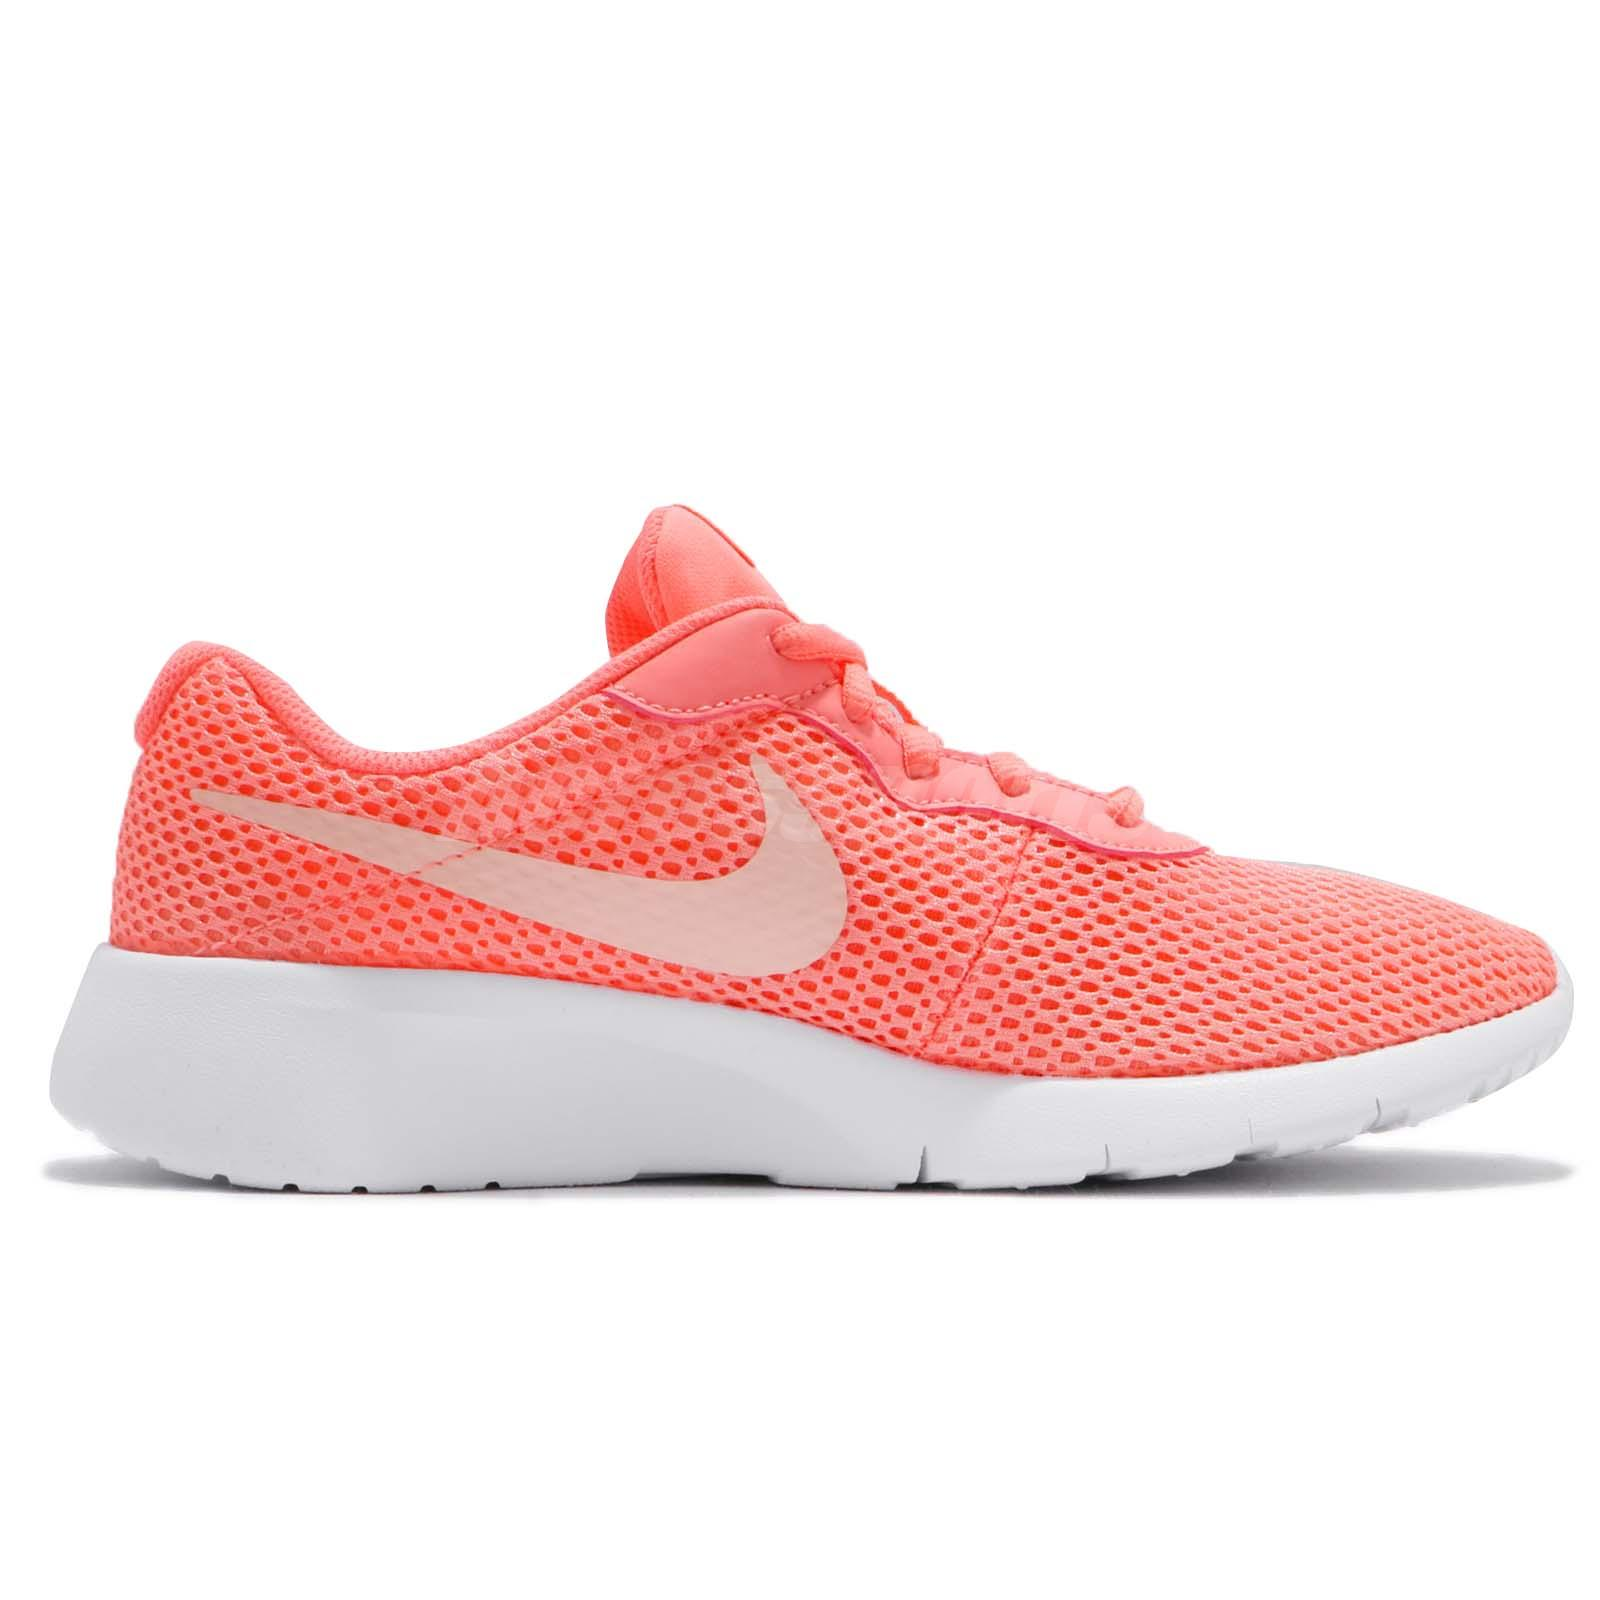 9a14c6f235e7c Details about Nike Tanjun GS Pink White Kids Girls Women Casual Shoes  Sneakers 818384-602